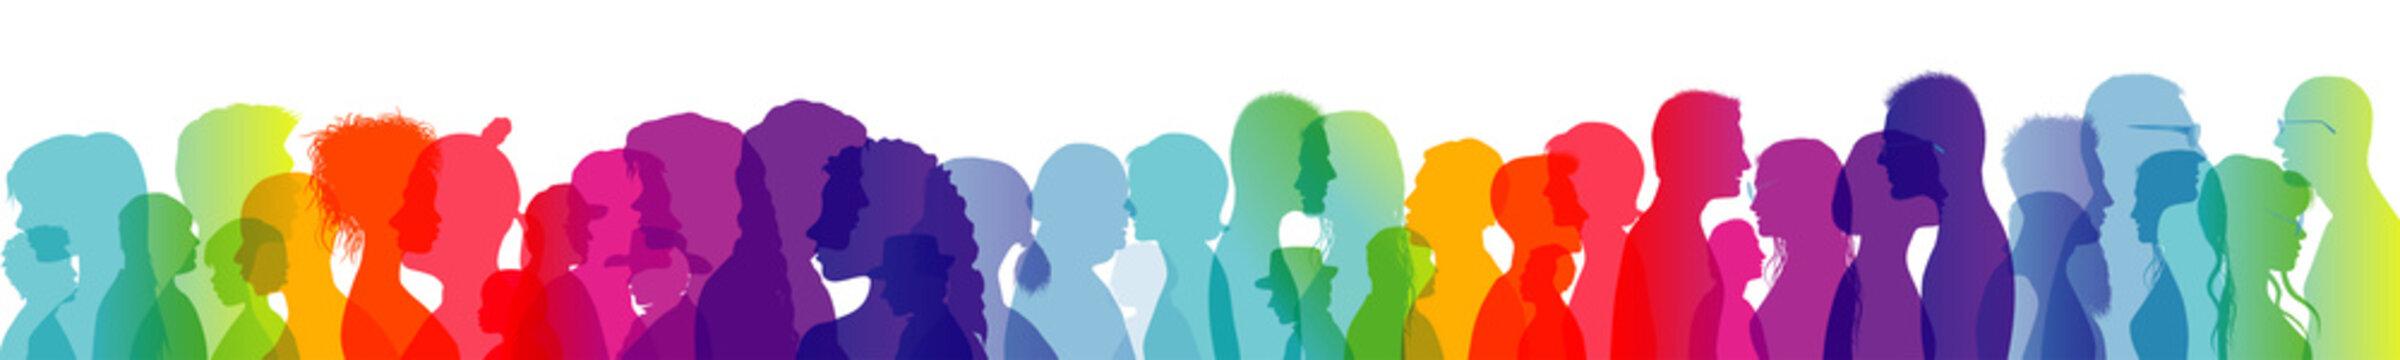 Talking crowd. Dialogue between people. People talking. Colored silhouette profiles. Multiple exposure